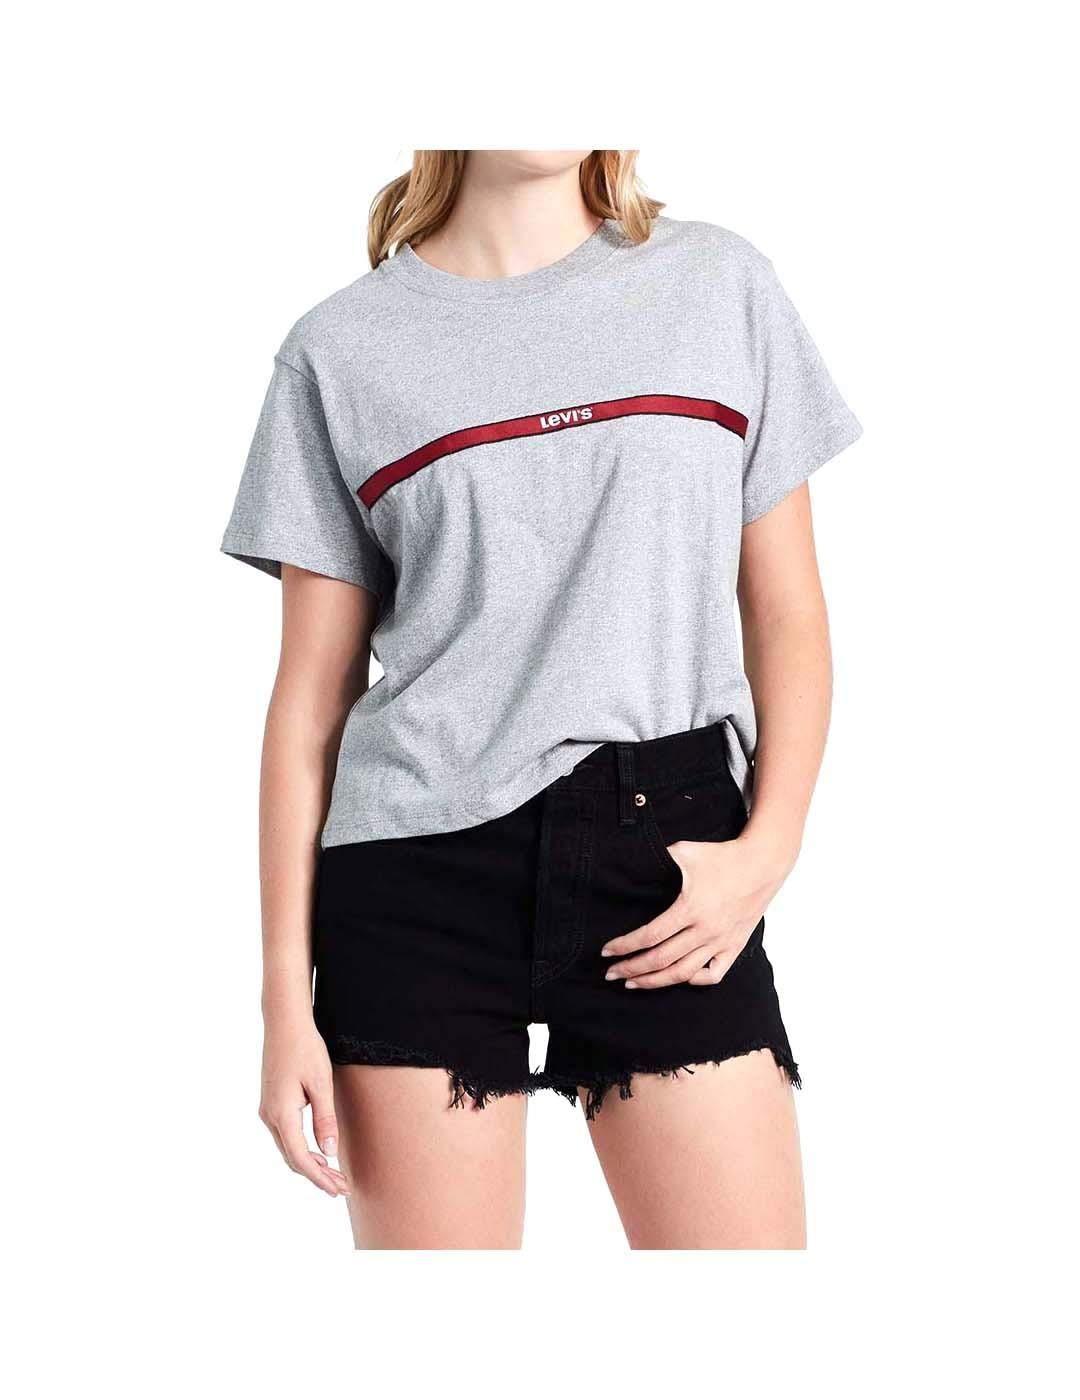 Camiseta Levis Graphic Varsity Text Gris Mujer